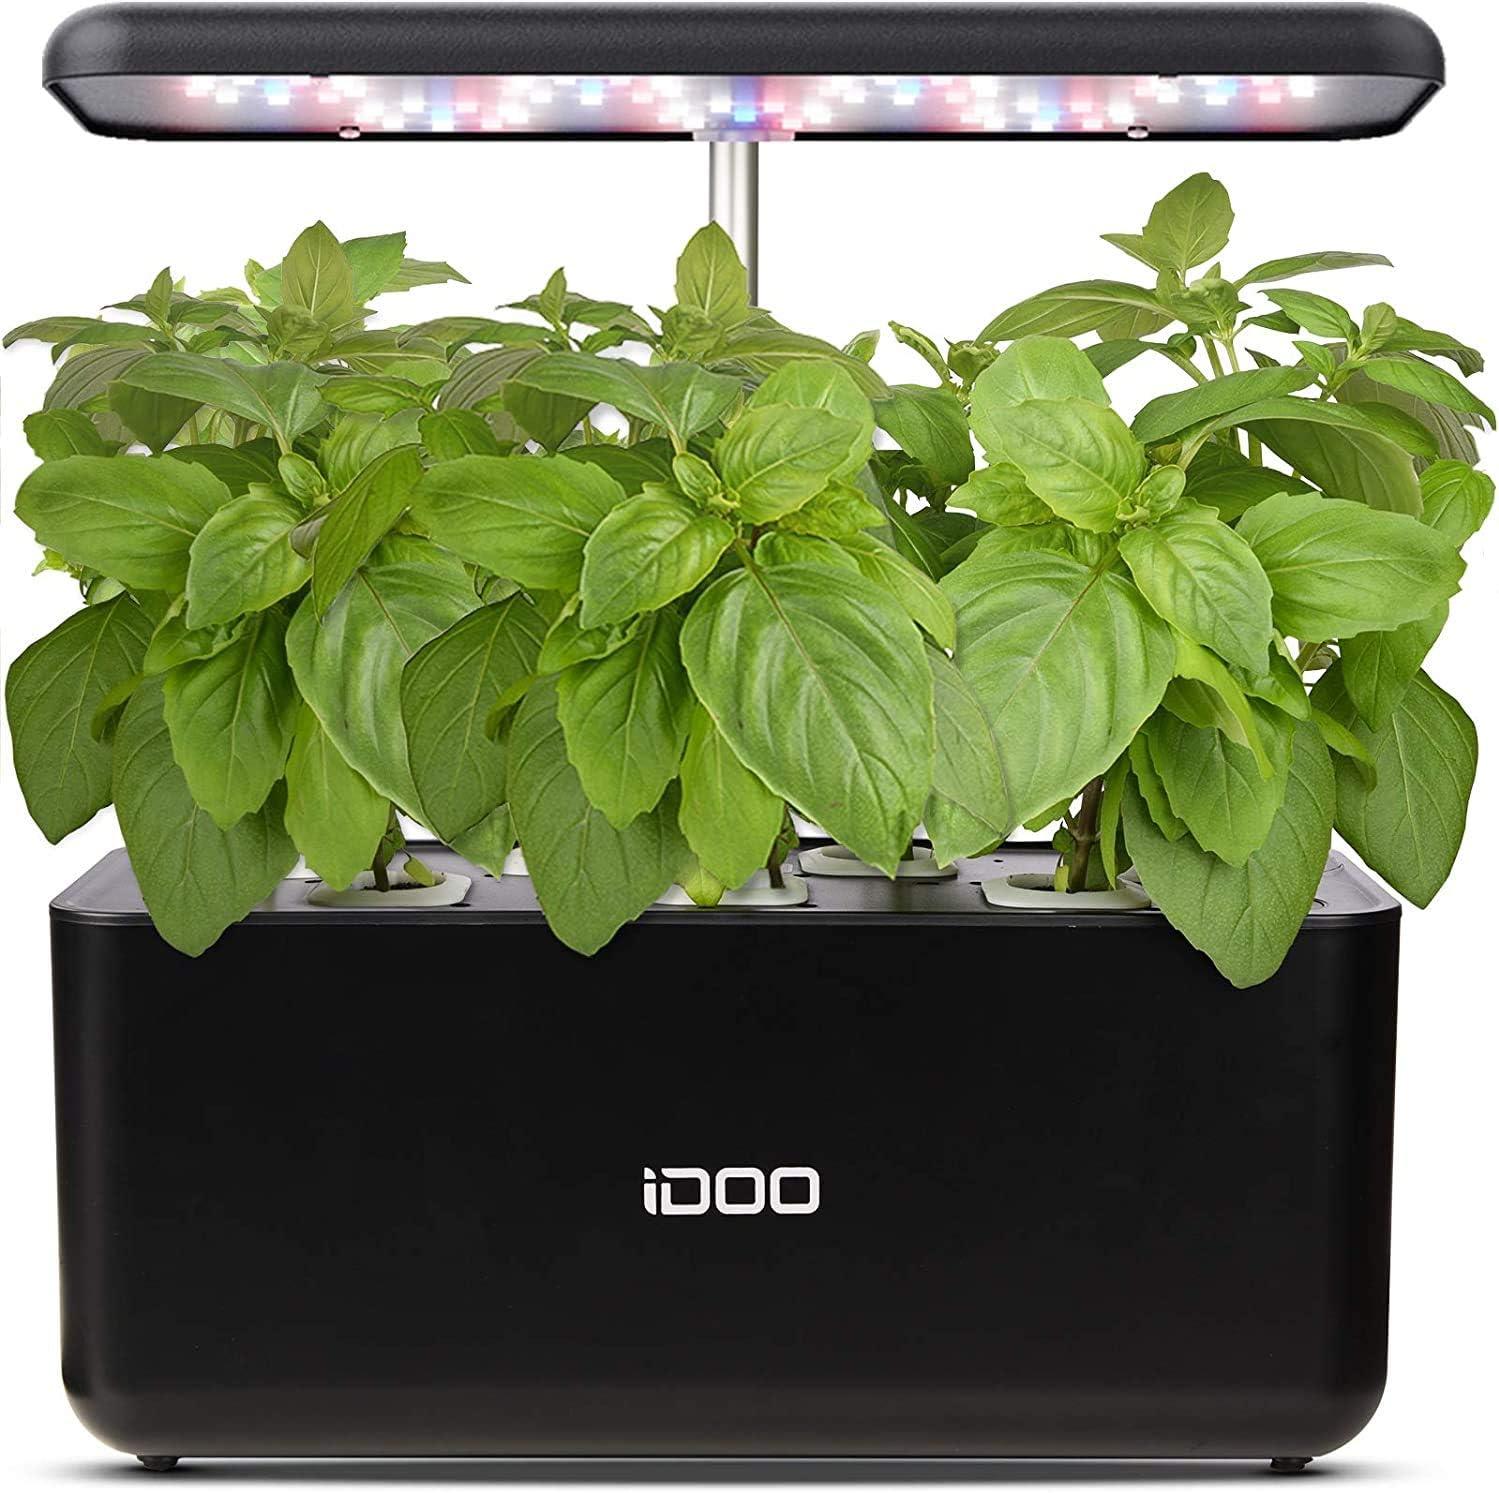 iDoo Hydroponics Growing System